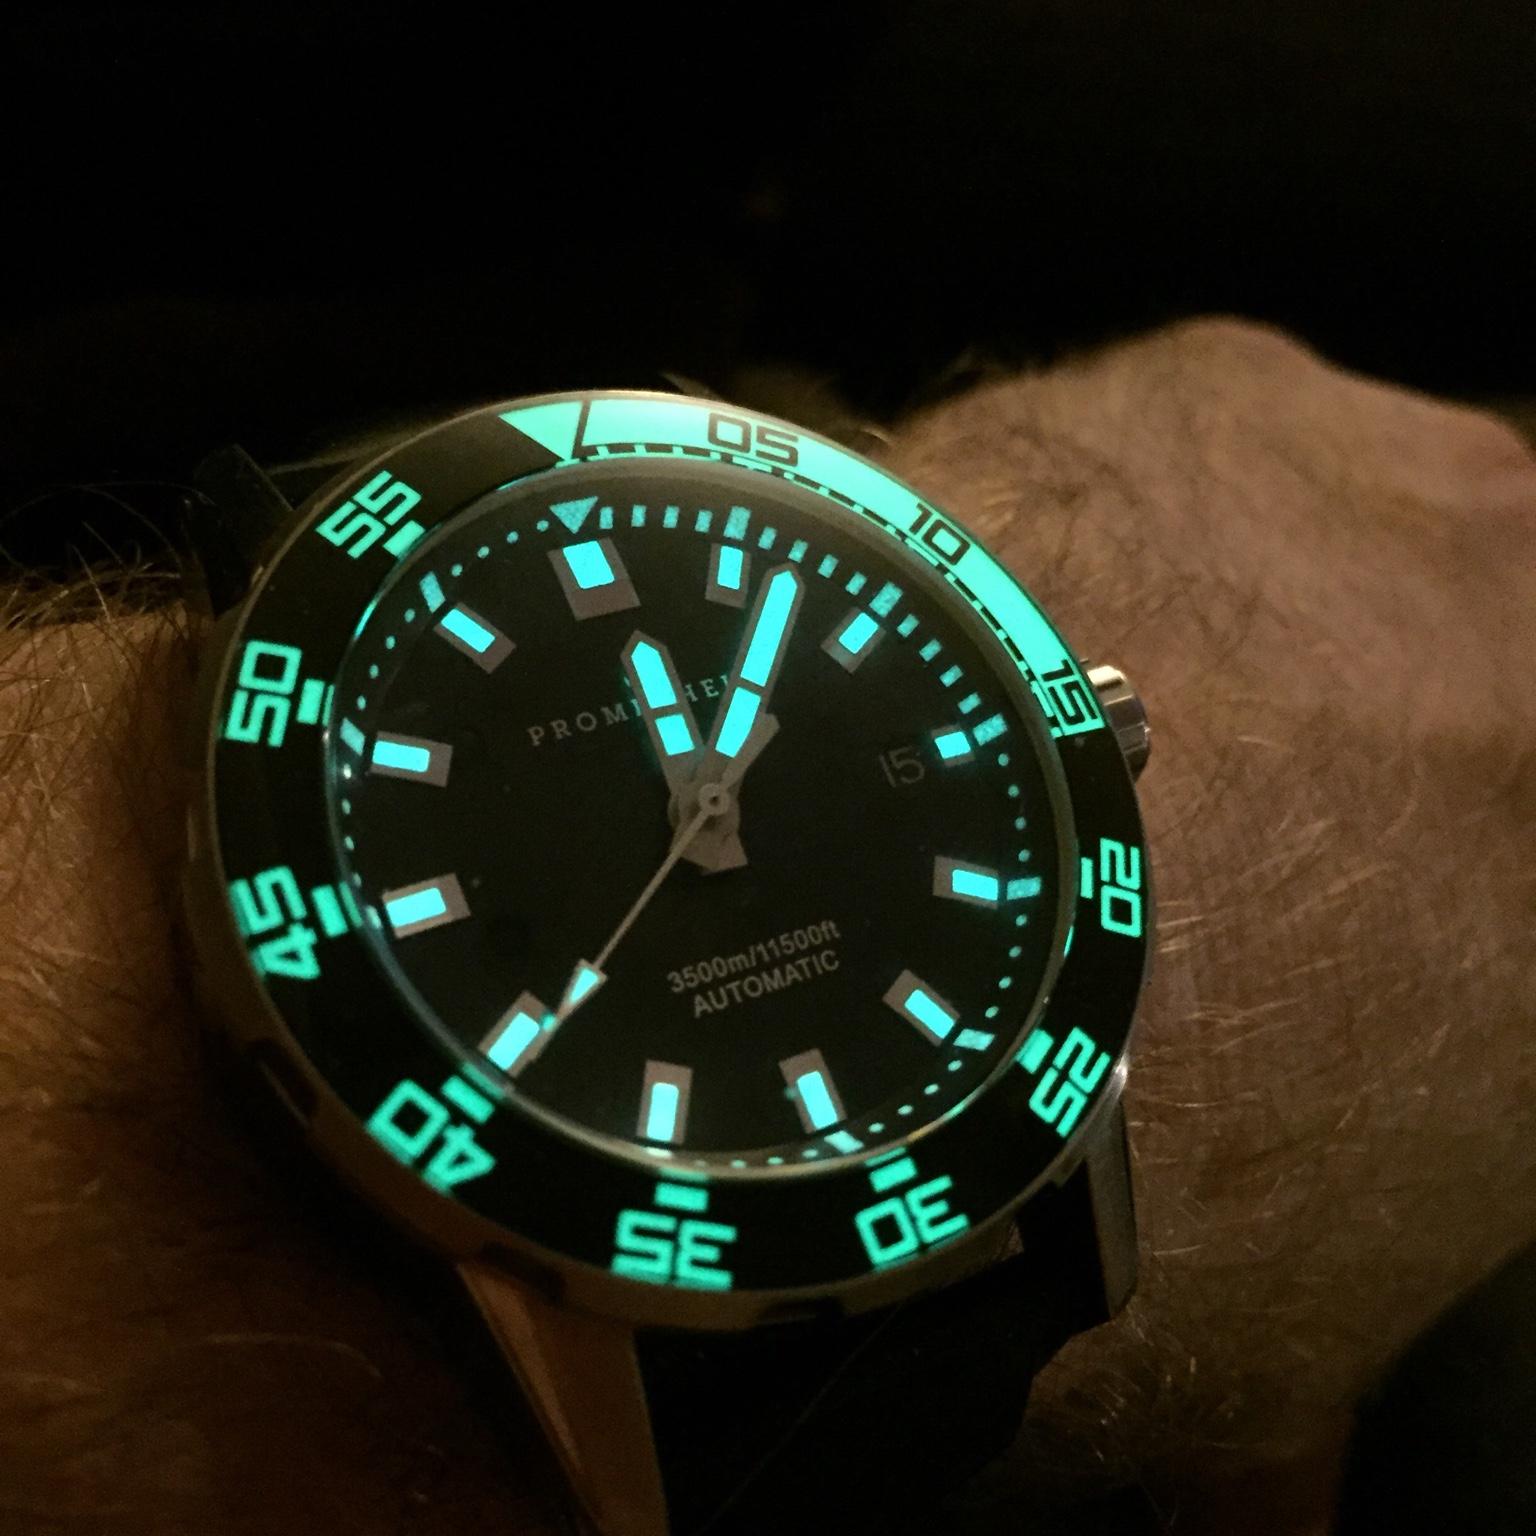 SOLD: Prometheus Poseidon 3500m SS Black/green